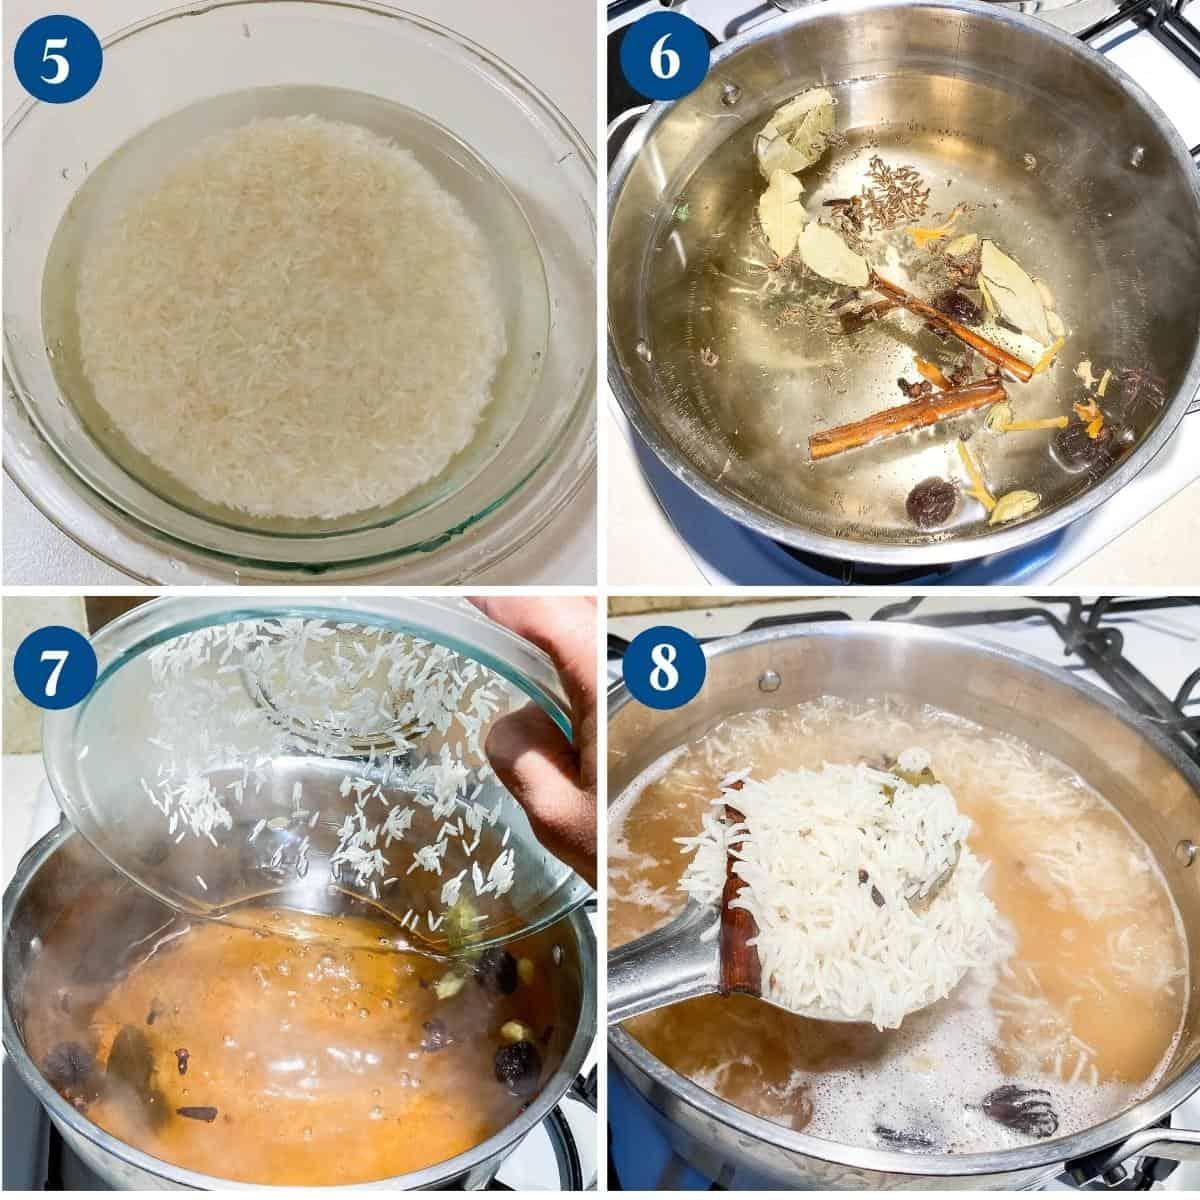 Progress pictures cooking rice for biryani.